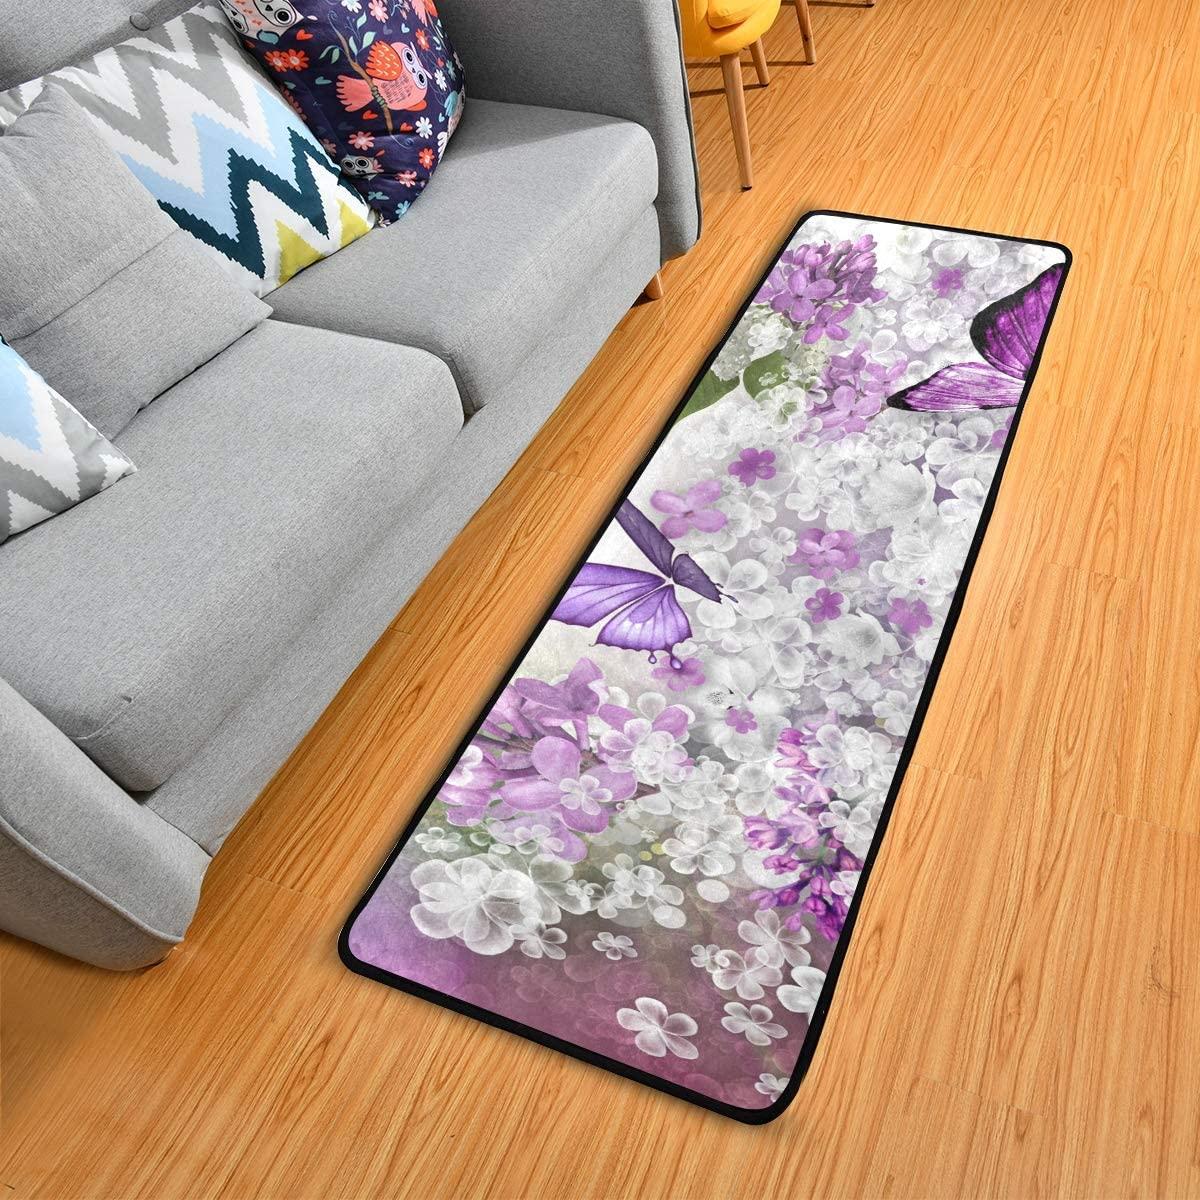 Butterflies Flowers Purple Kitchen Rugs Non-Slip Soft Doormats Bath Carpet Floor Runner Area Rugs for Home Dining Living Room Bedroom 72